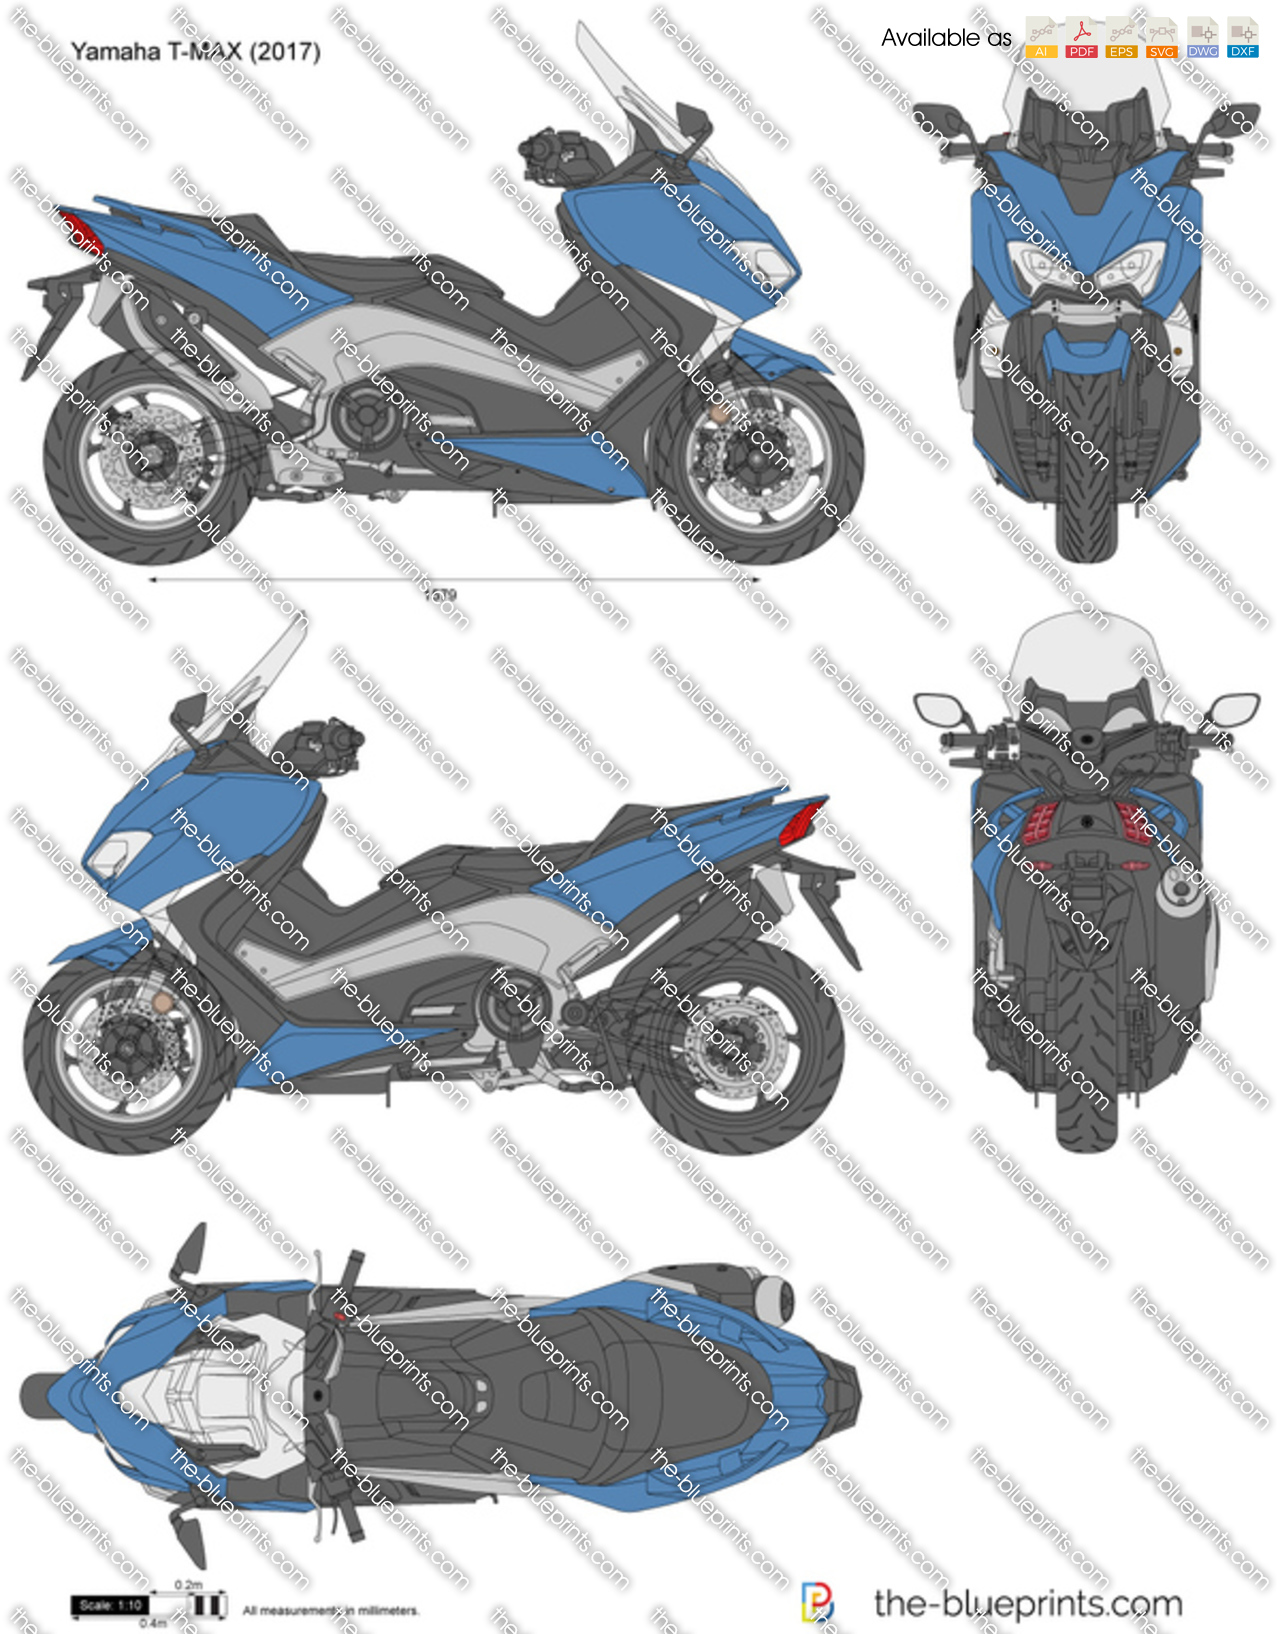 Yamaha T-MAX 2018